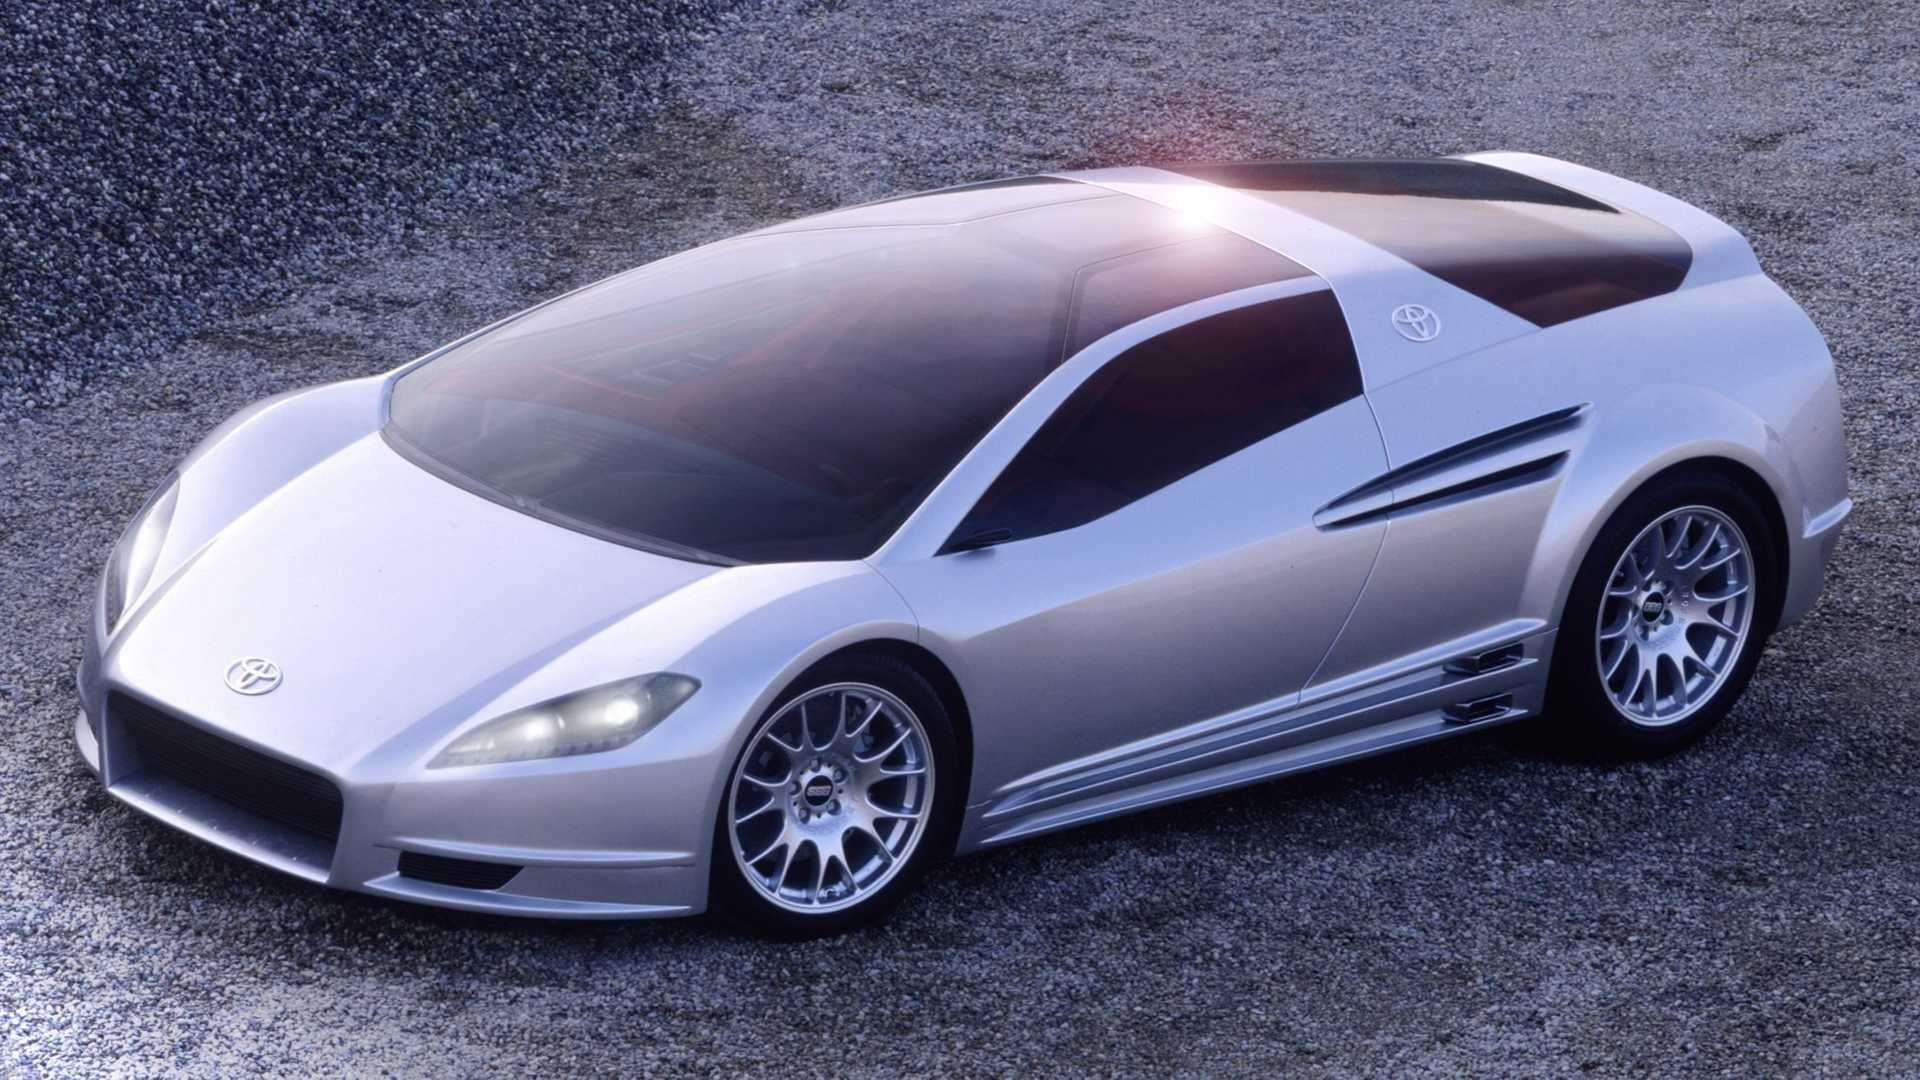 Toyota-Alessandro-Volta-concept-2004-15